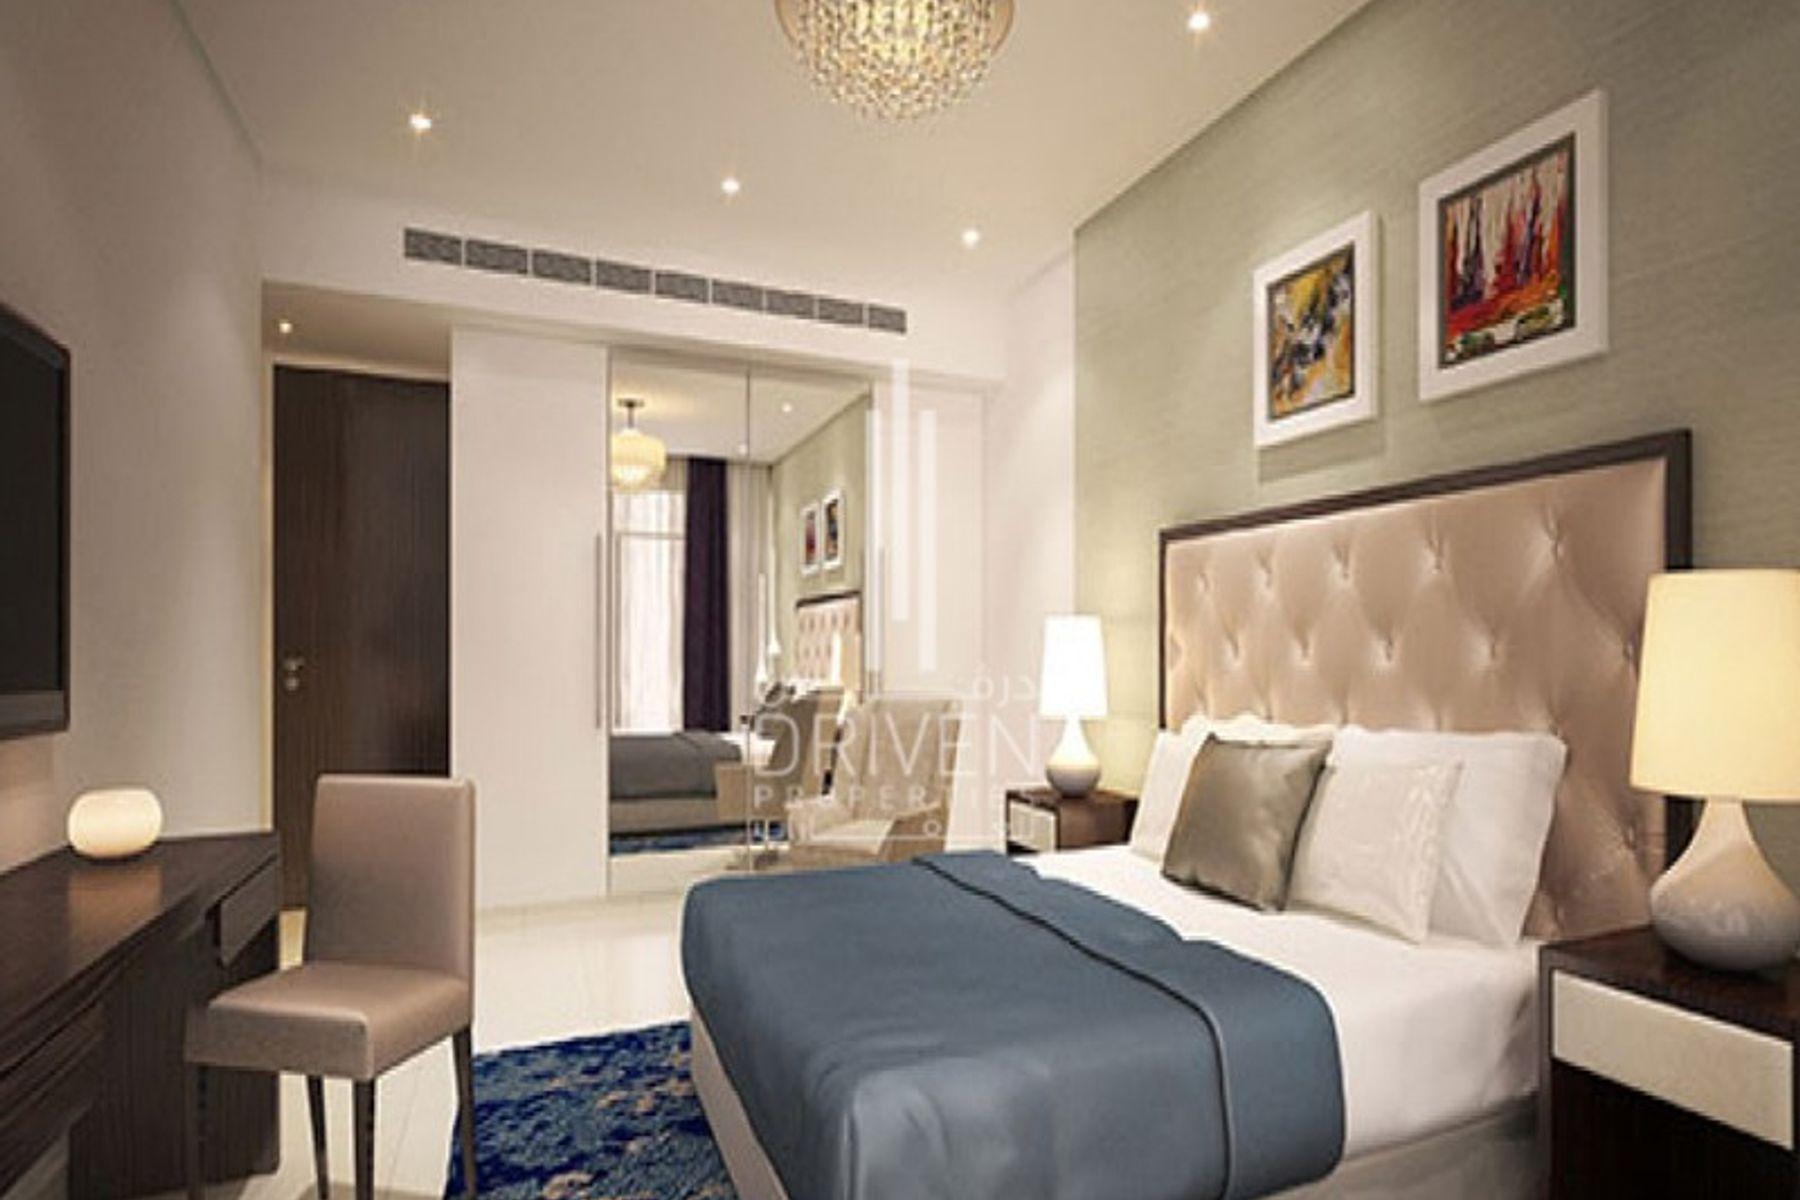 Apartment for Sale in Celestia - Dubai South (Dubai World Central)